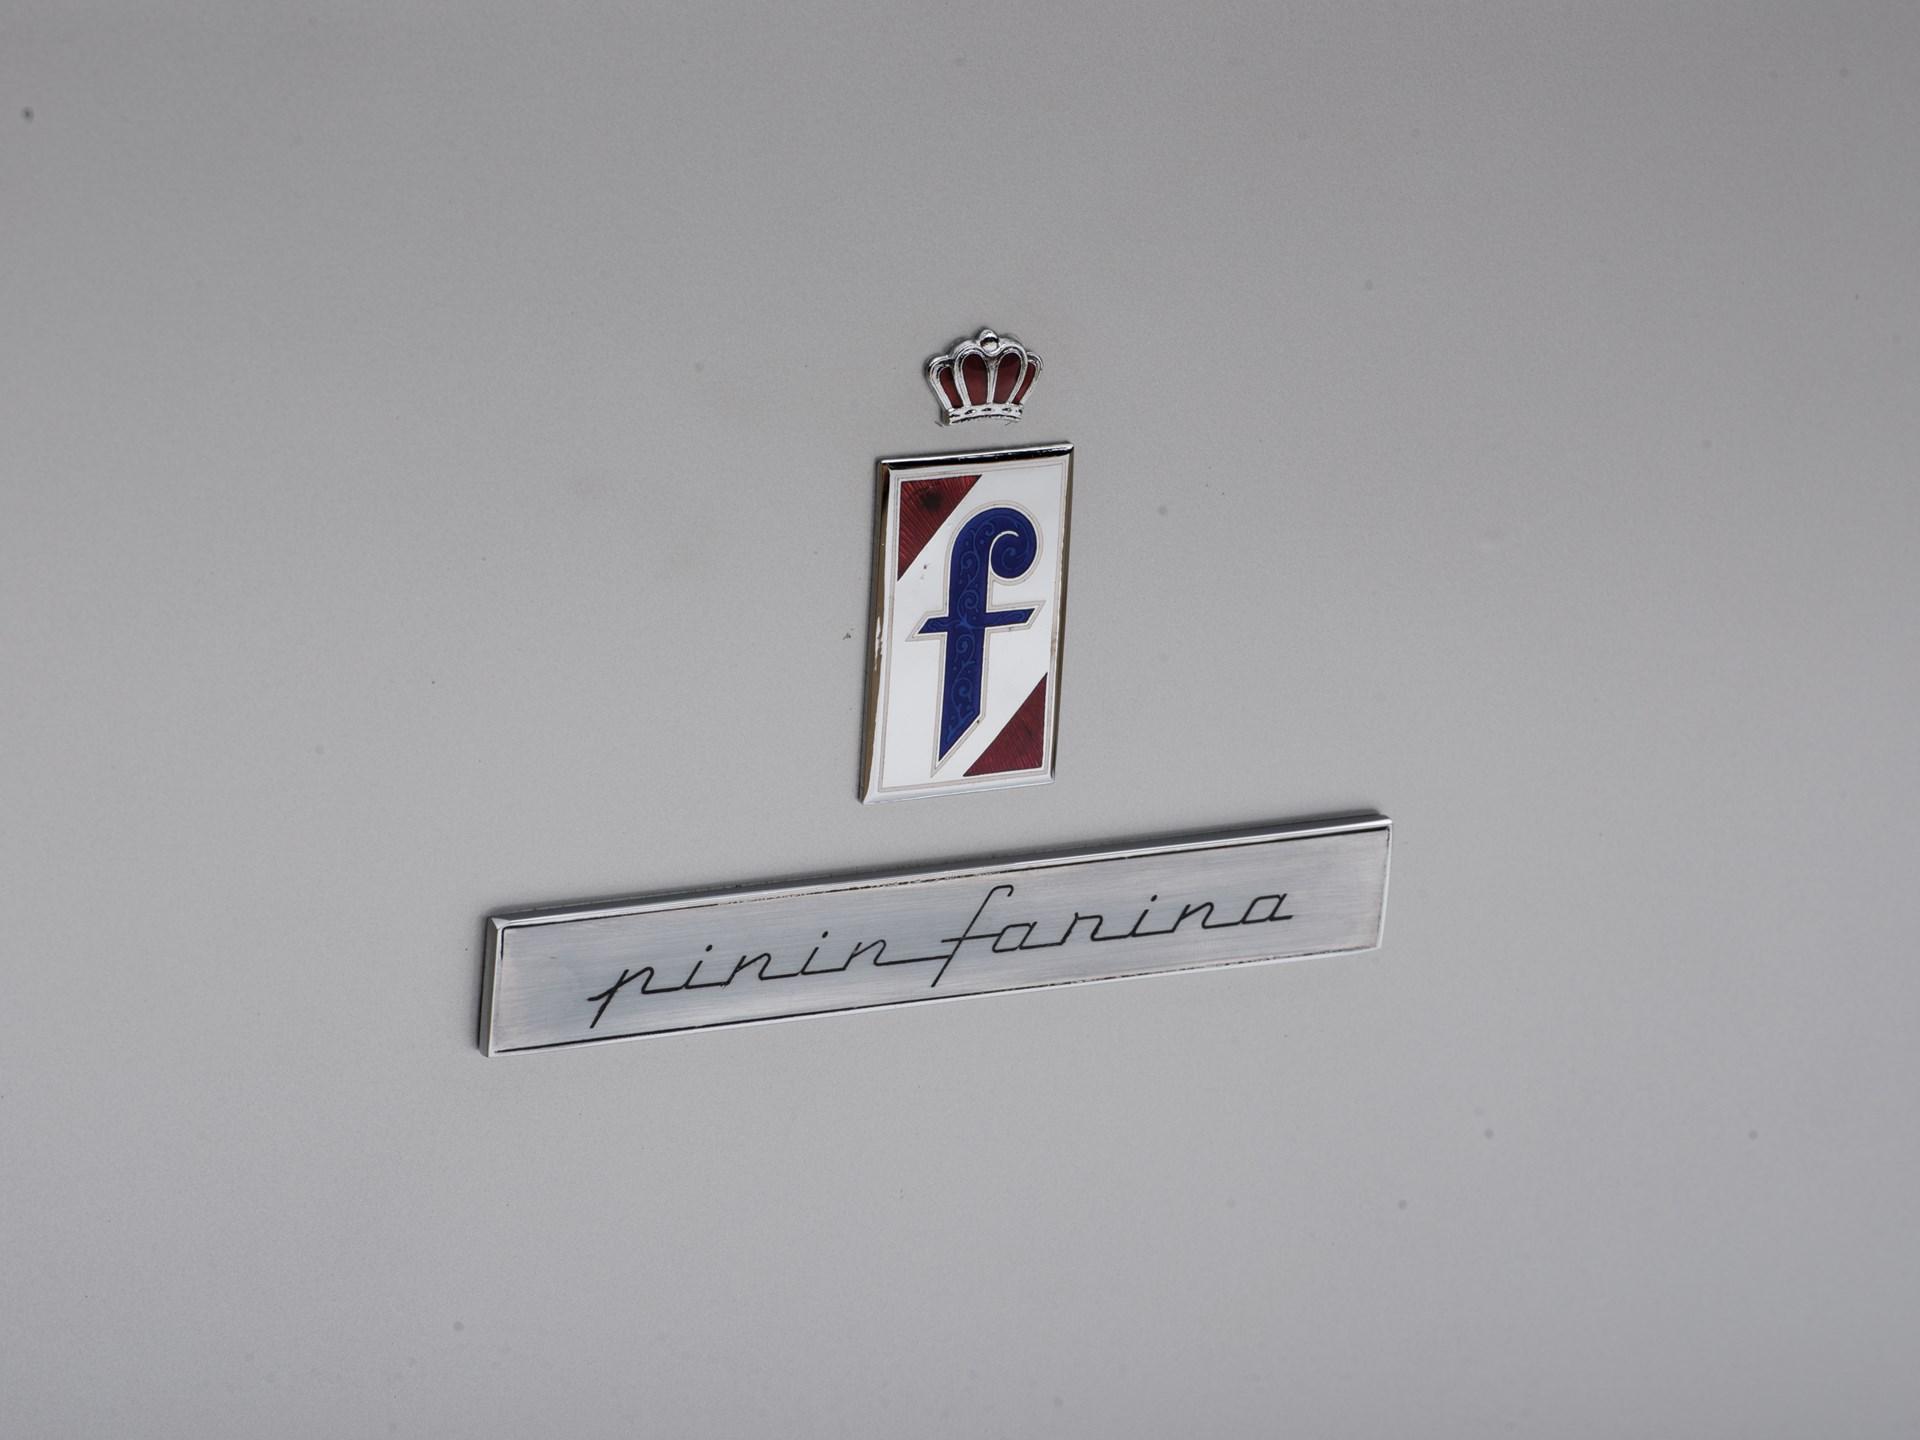 1963 Ferrari 400 Superamerica LWB Coupe Aerodinamico by Pininfarina